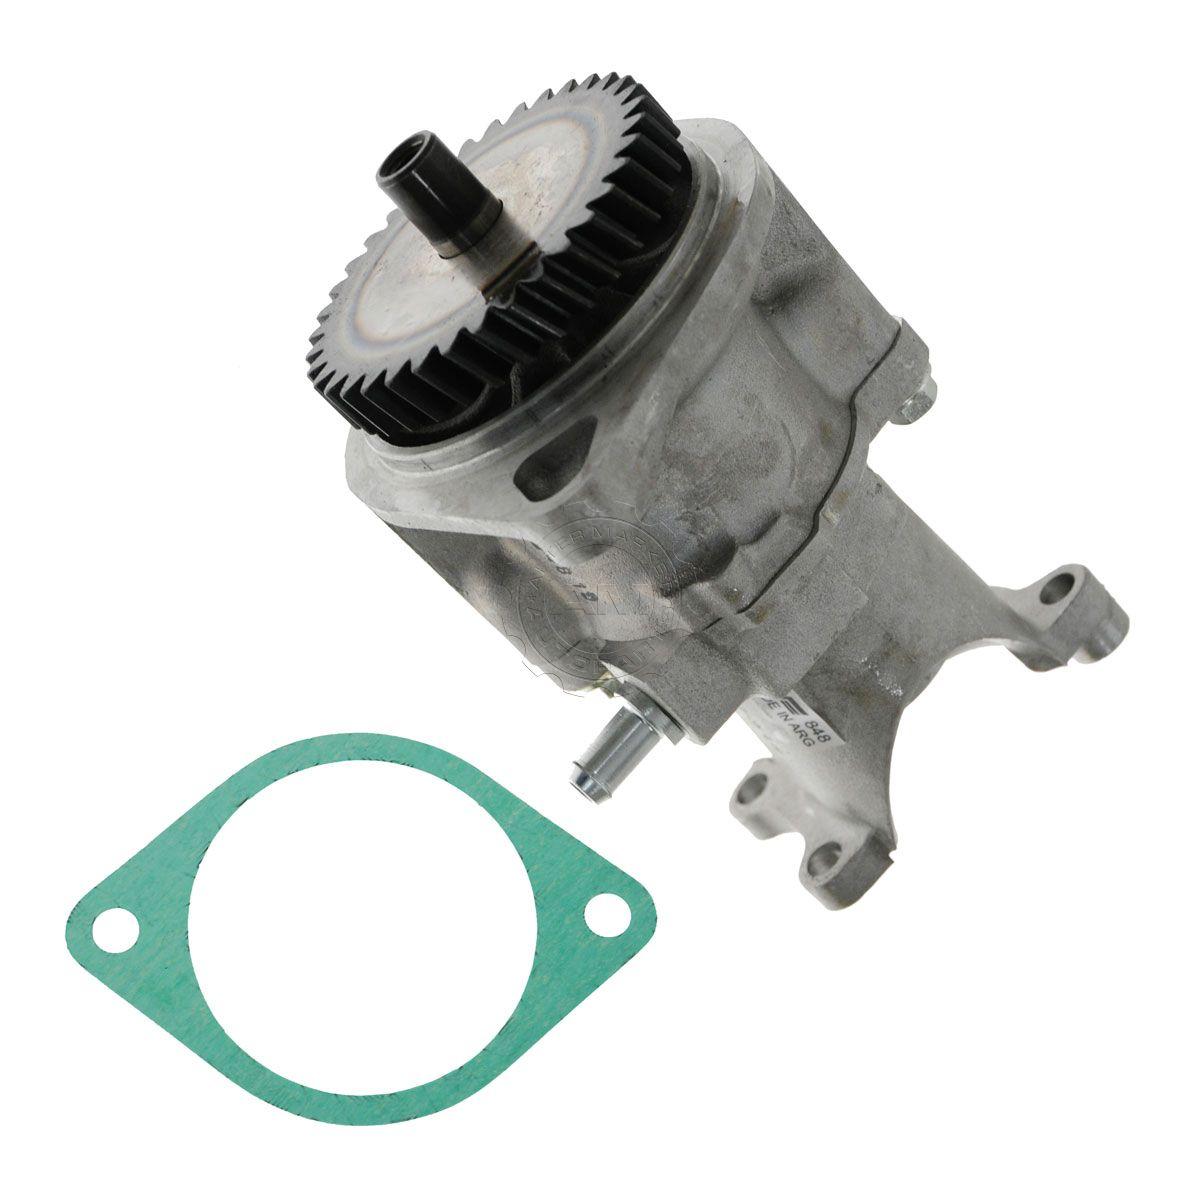 hight resolution of dorman engine vacuum pump w gasket 5019734aa for dodge ram pickup truck